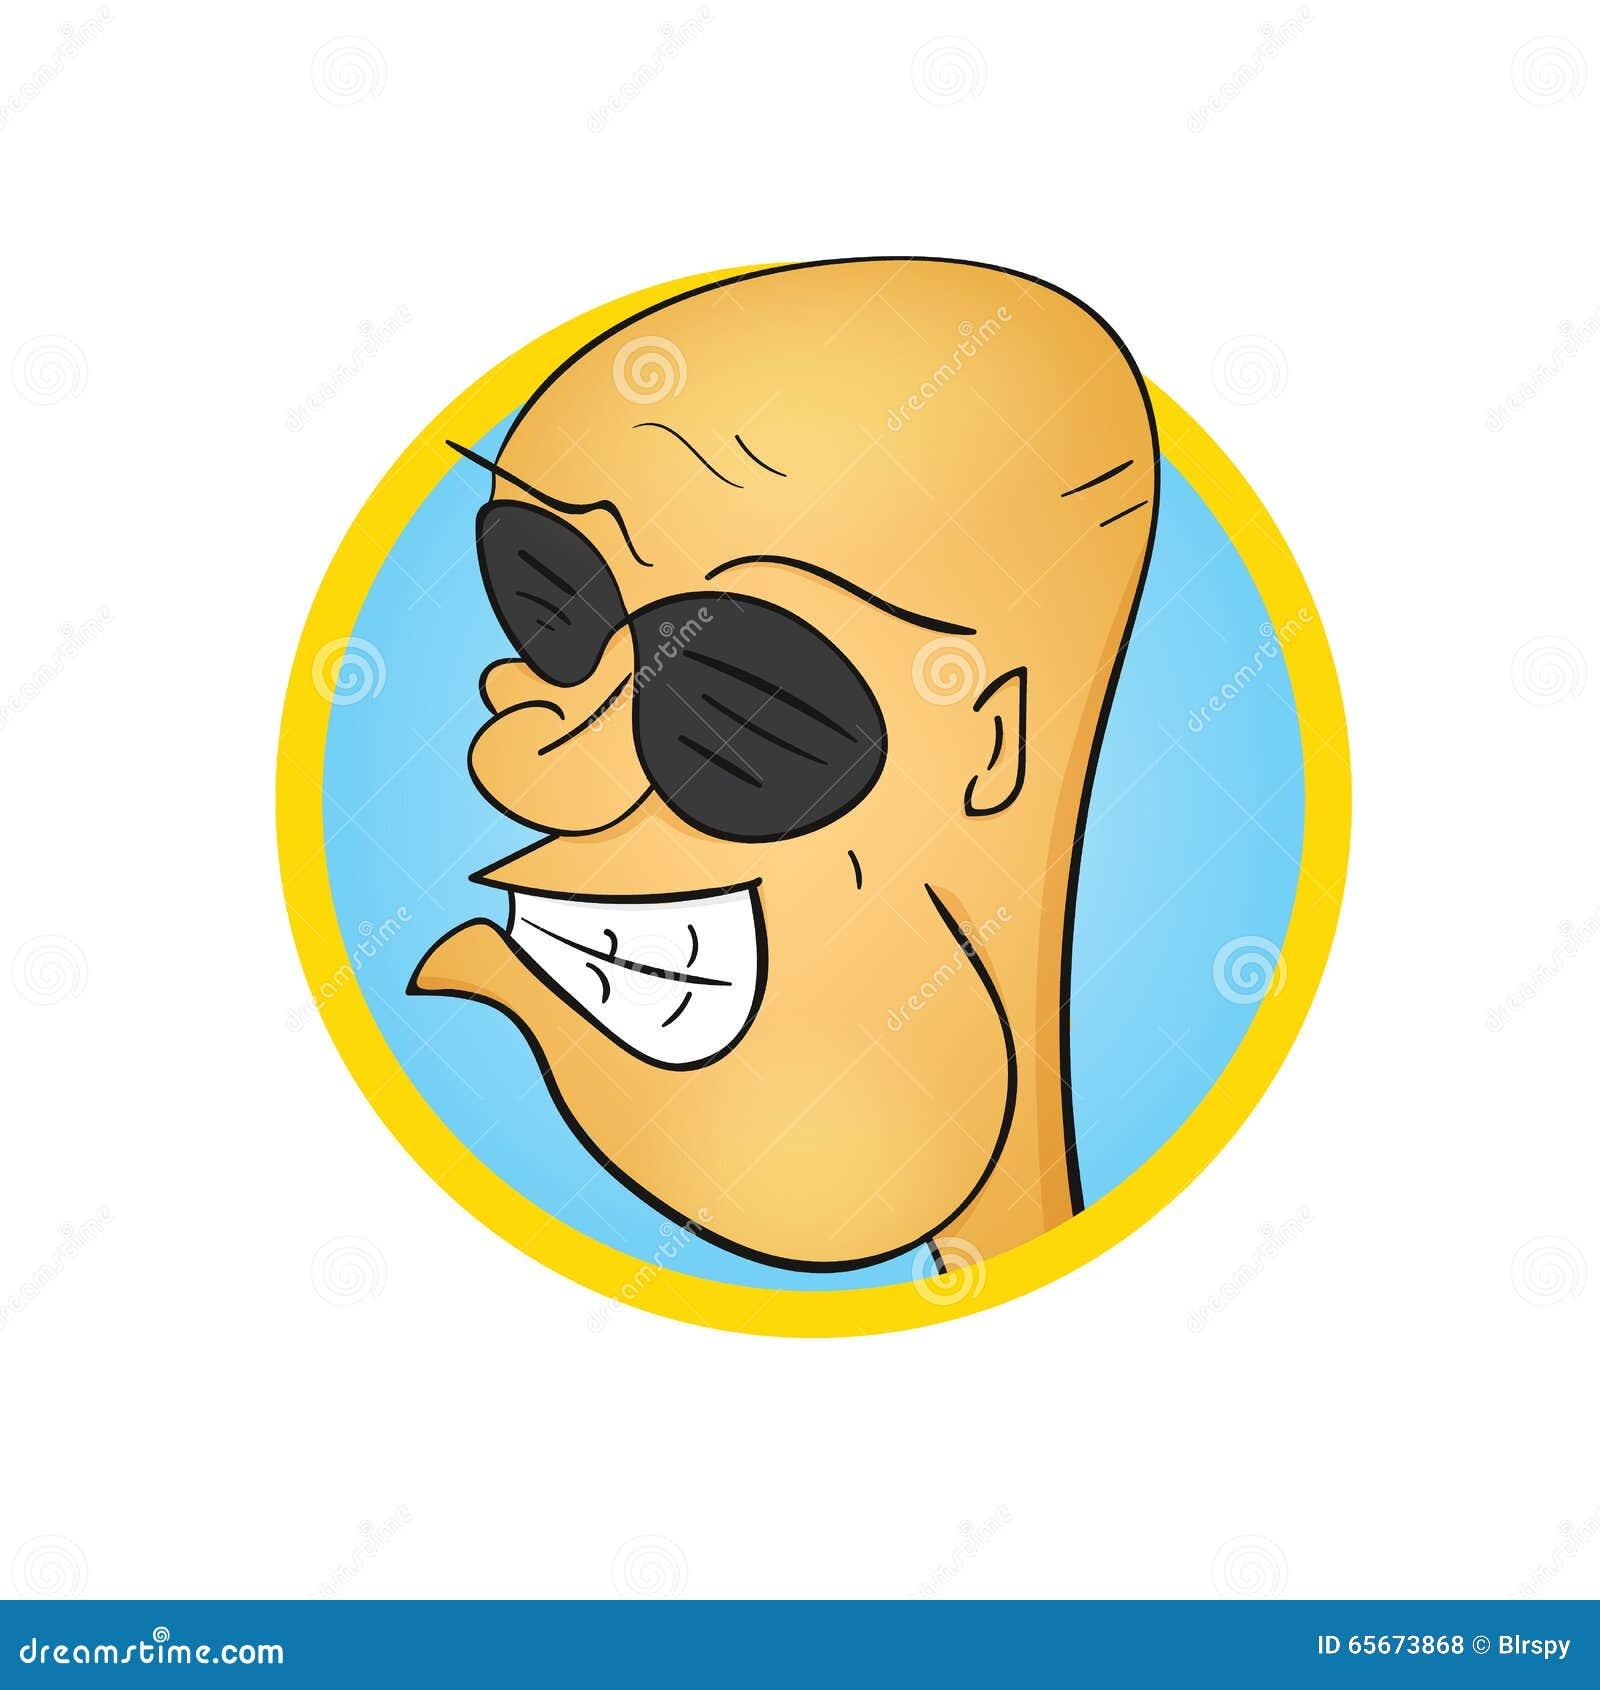 Funny Bald Cartoon Character In Sunglasses Illustration 65673868 Megapixl